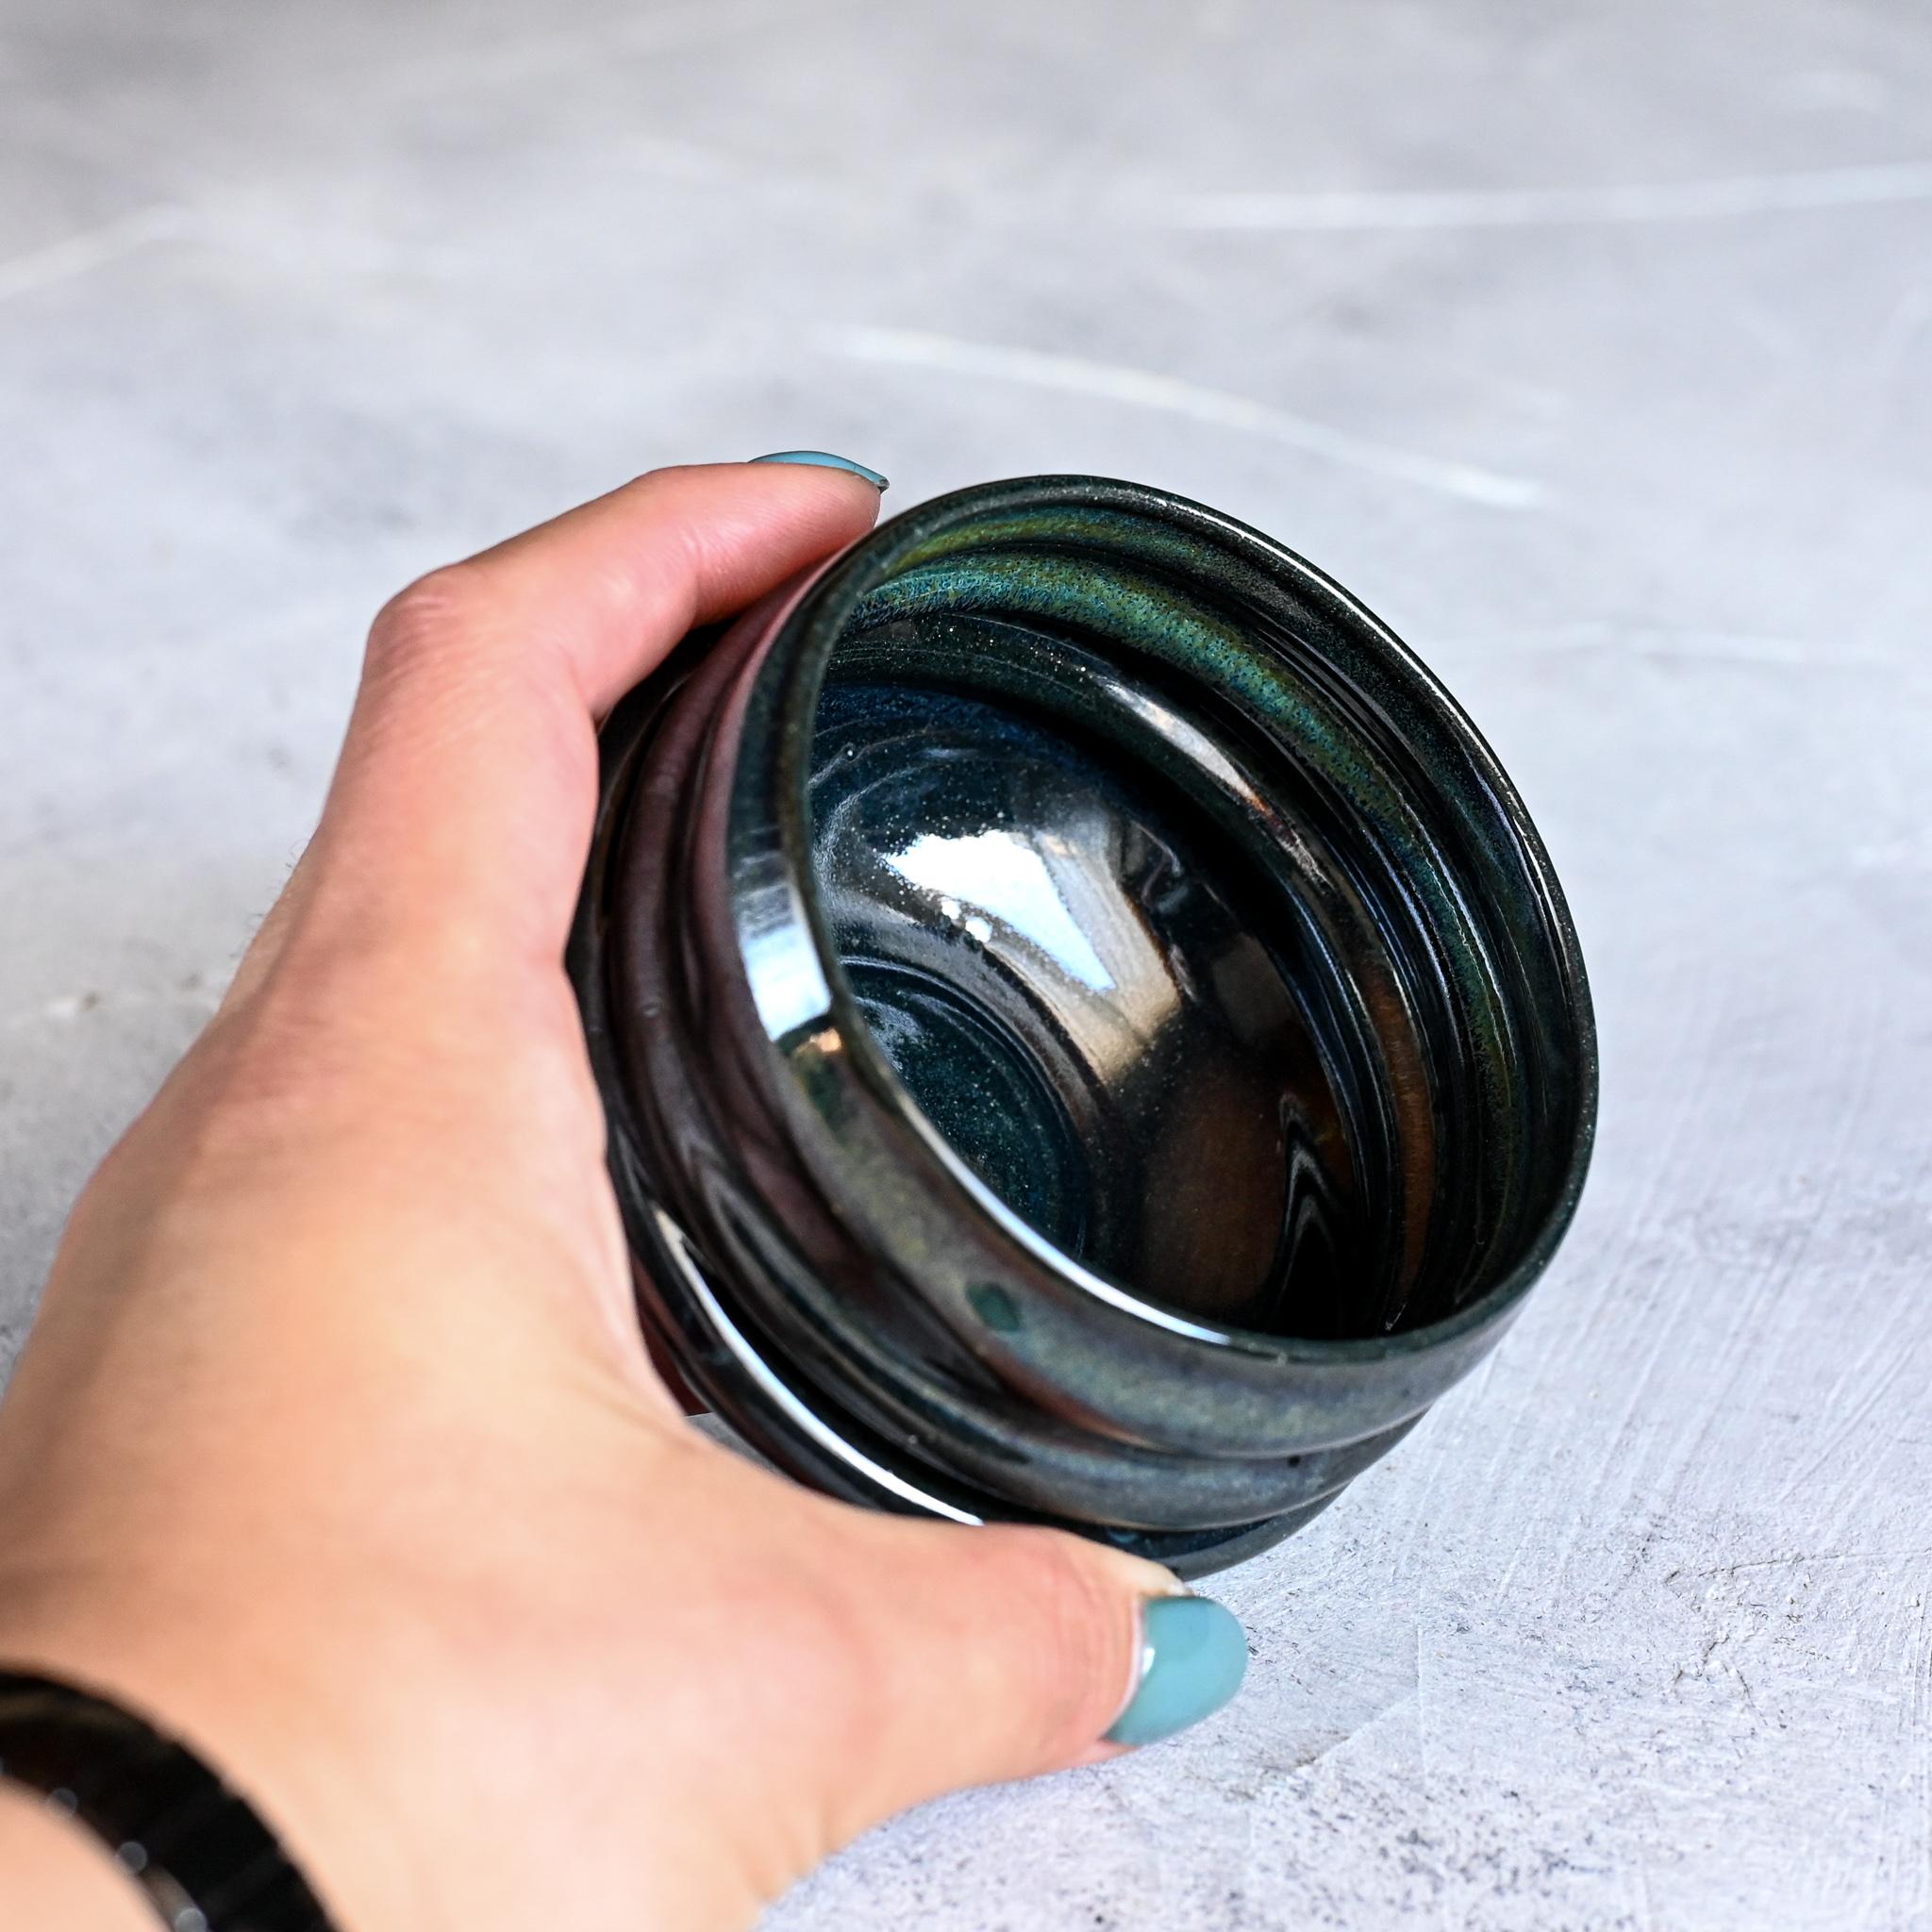 картинка Керамический стакан юноми Марии Левиной 9 - DishWishes.Ru